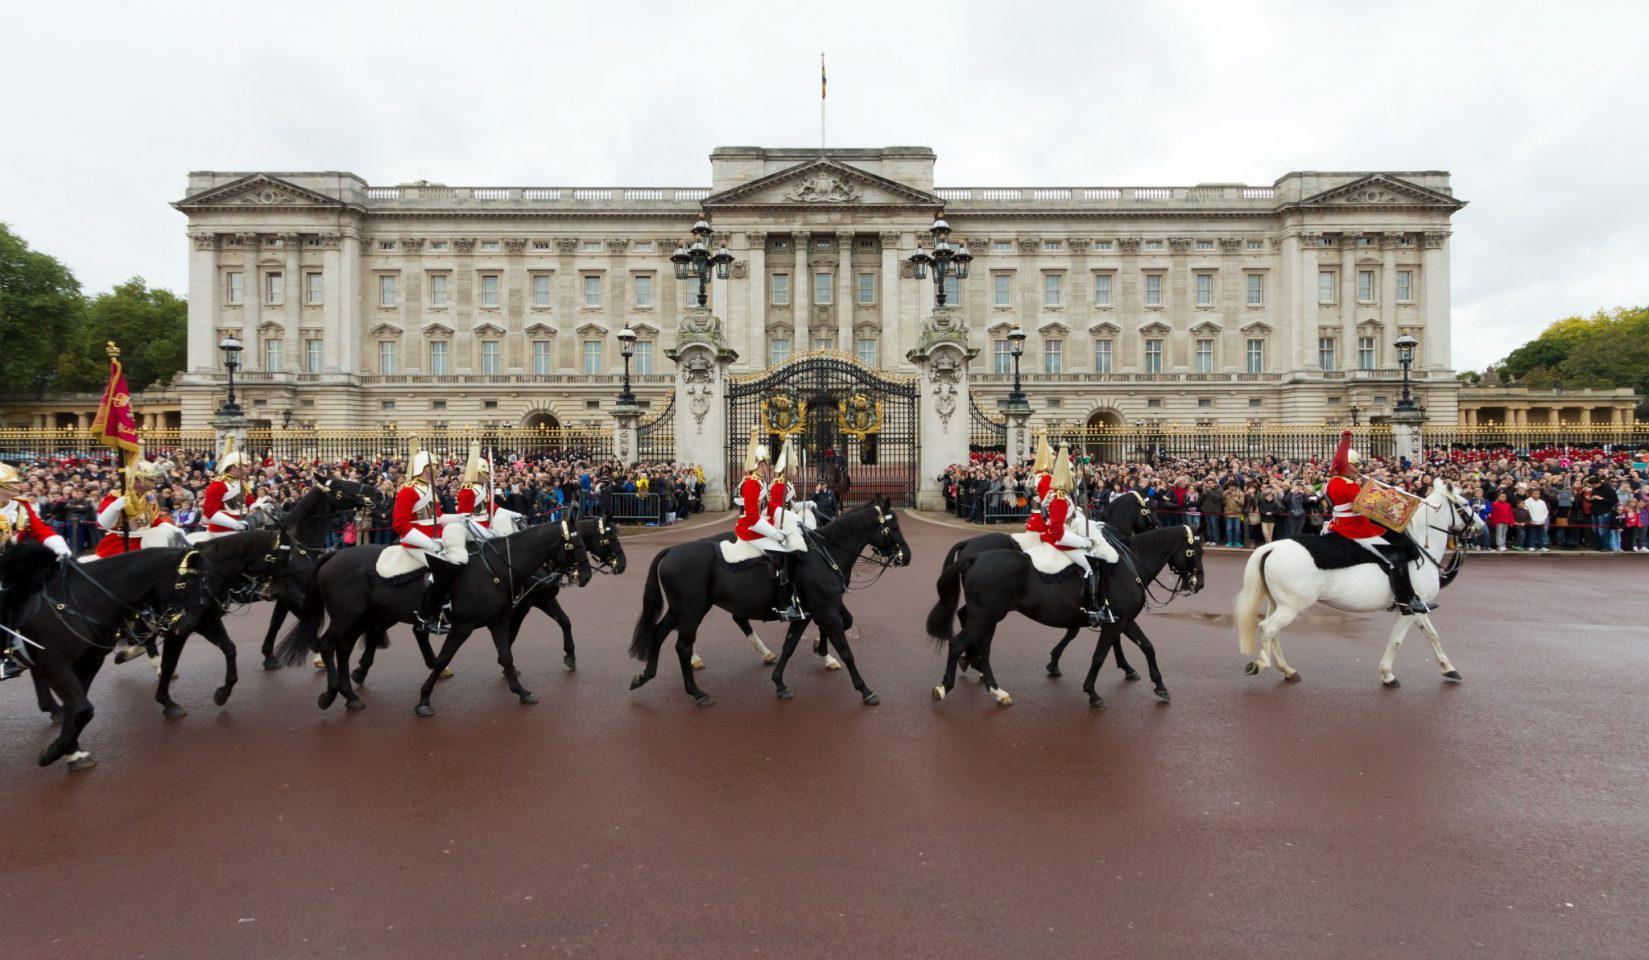 London_20pl_shutterstock_129133007 Ταξίδι στο Λονδίνο: Τα καλύτερα αξιοθέατα στην πρωτεύουσα της Αγγλίας